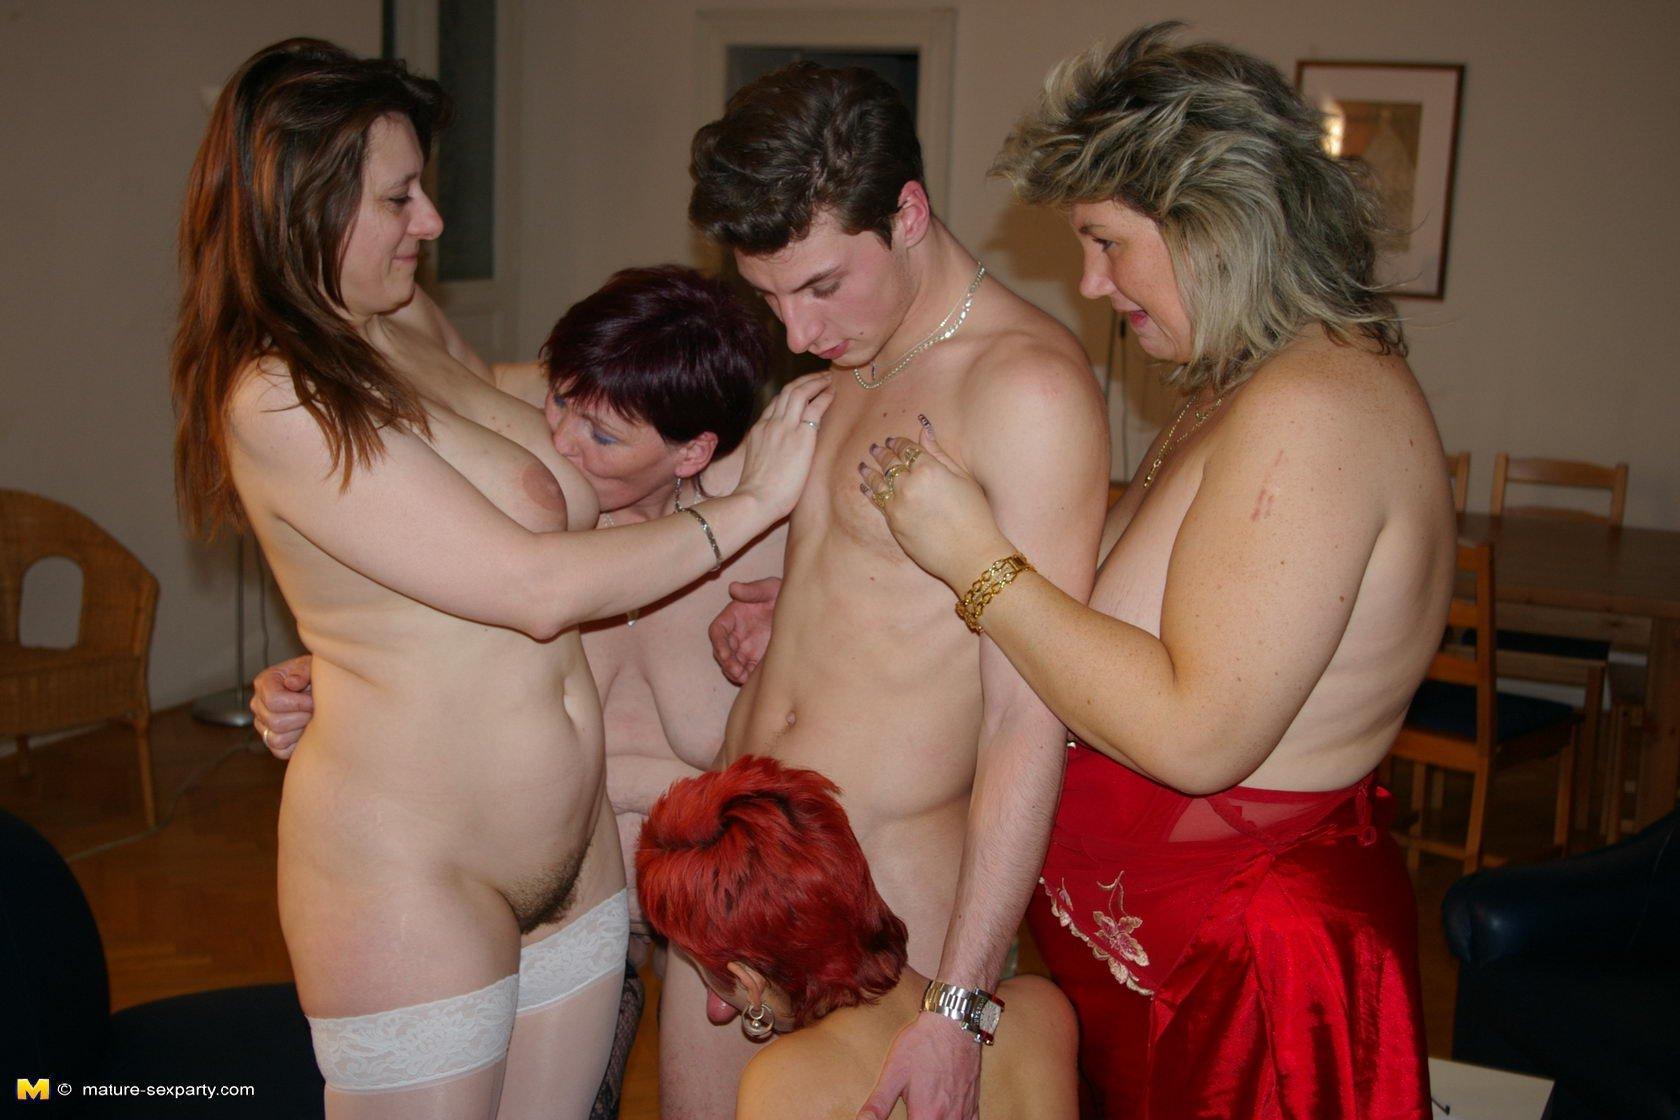 Gorgeous women giving hand job